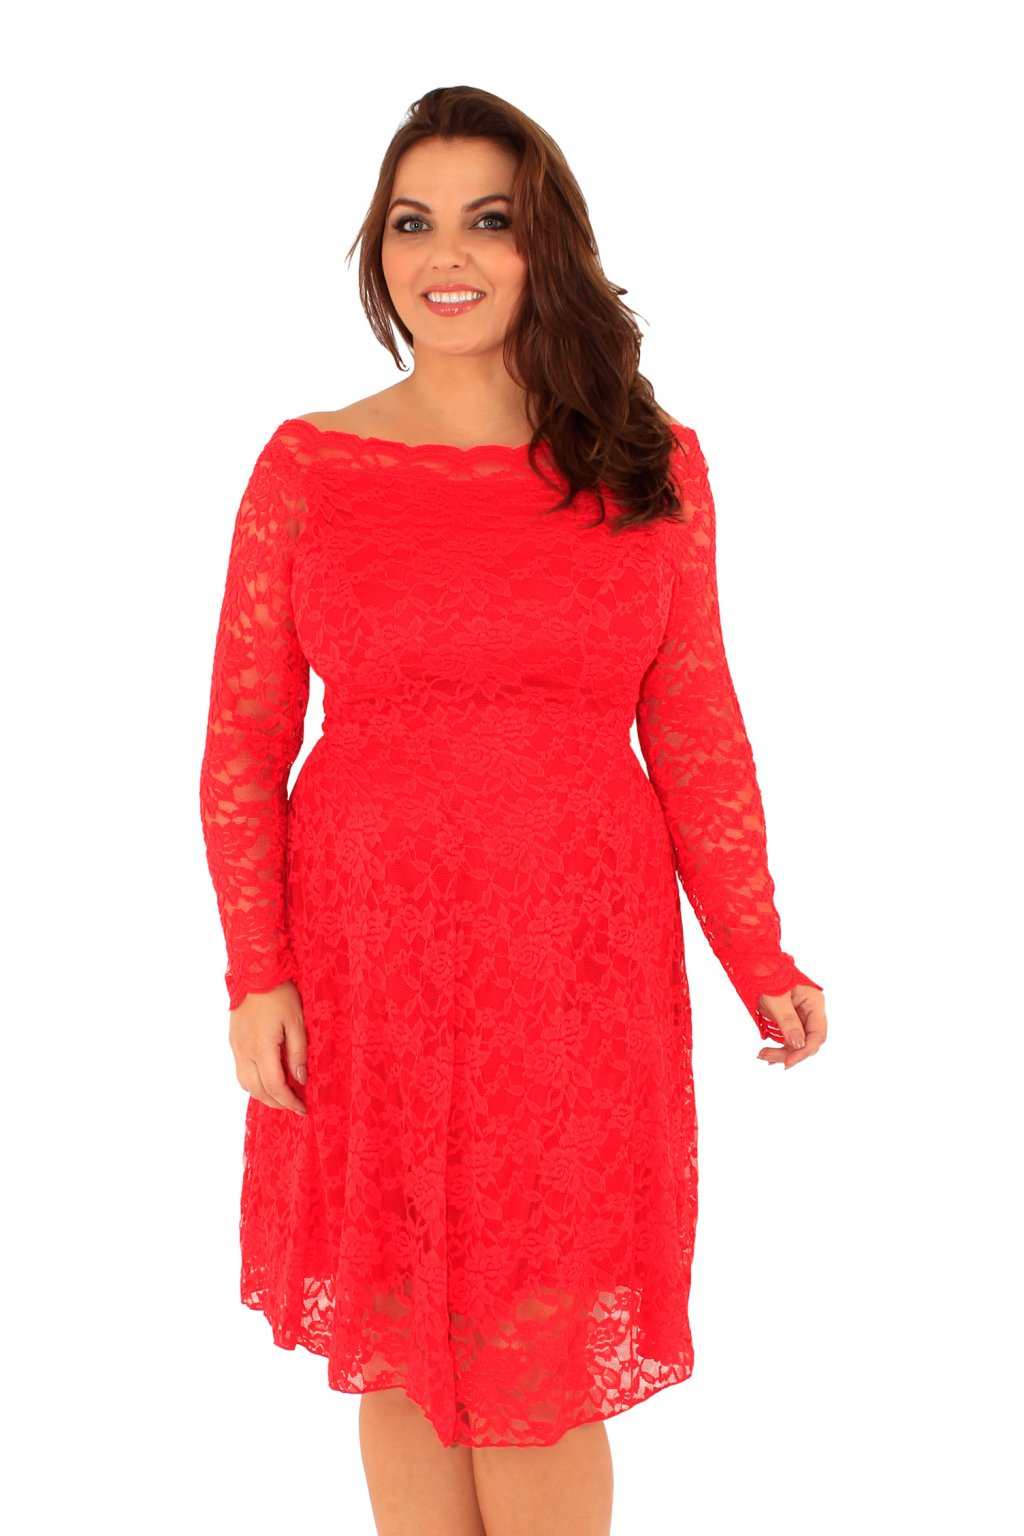 Krajkové šaty Coco s odhaleným dekoltem červené 2